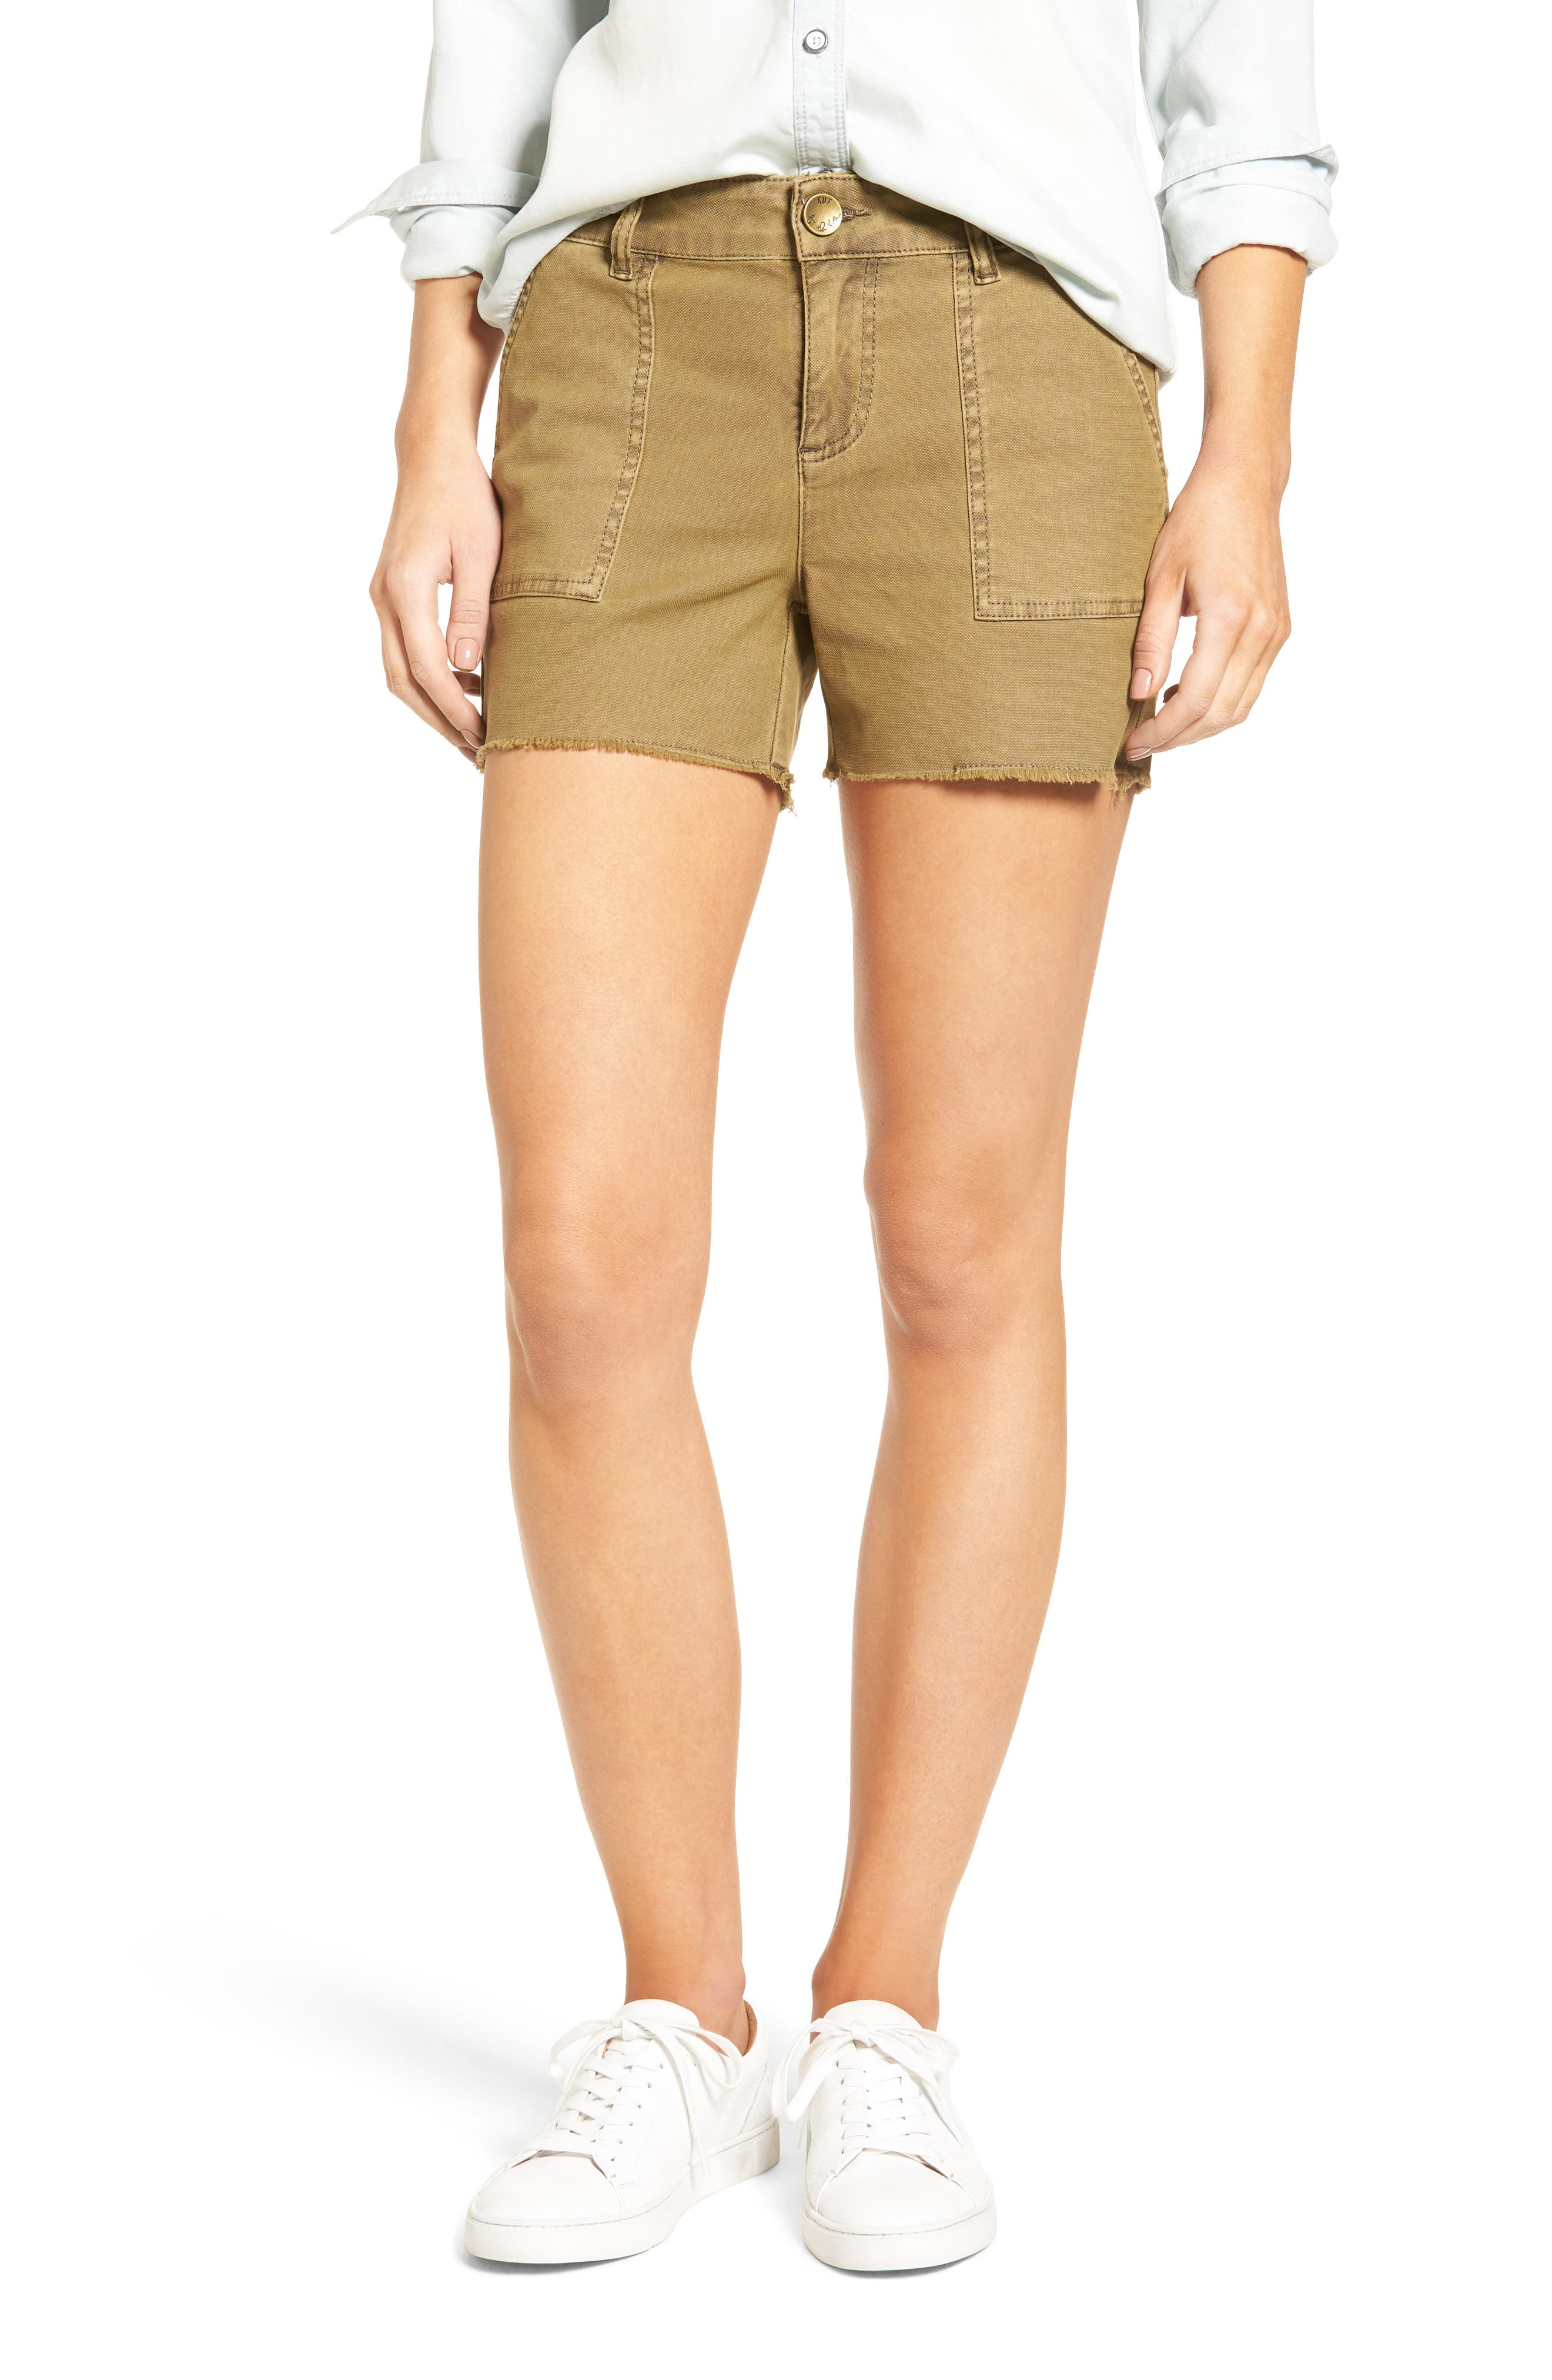 KUT from the Kloth Gidget Cutoff Shorts